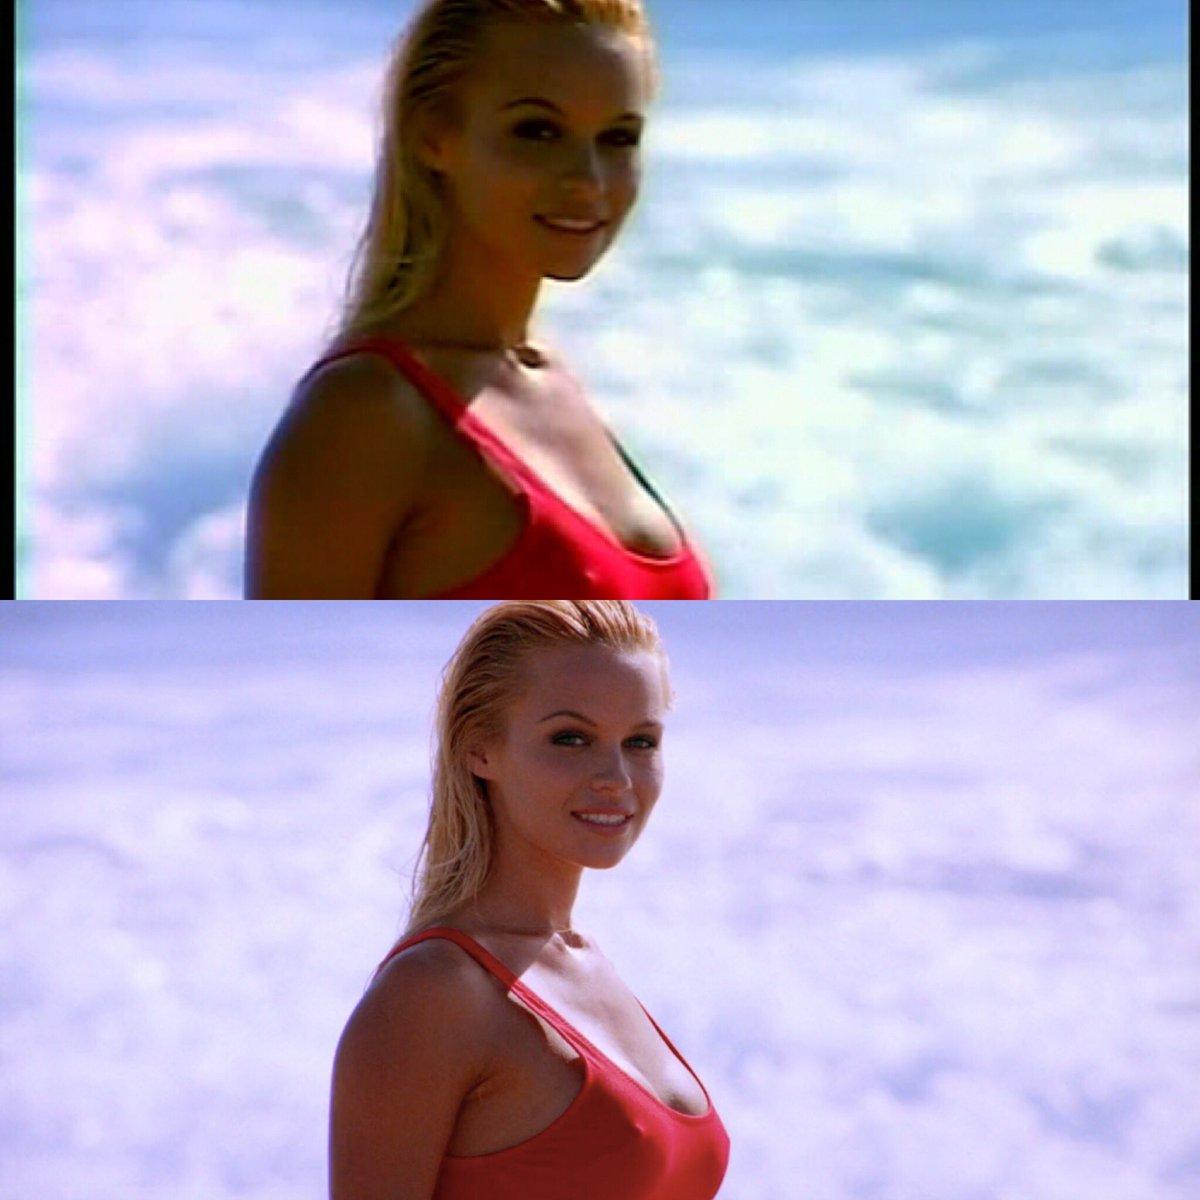 RT @BaywatchTV_org: Baywatch in HD was truly worth the wait #baywatch #PamelaAnderson #AmazonPrimeVideo https://t.co/c8cK2nW0LS